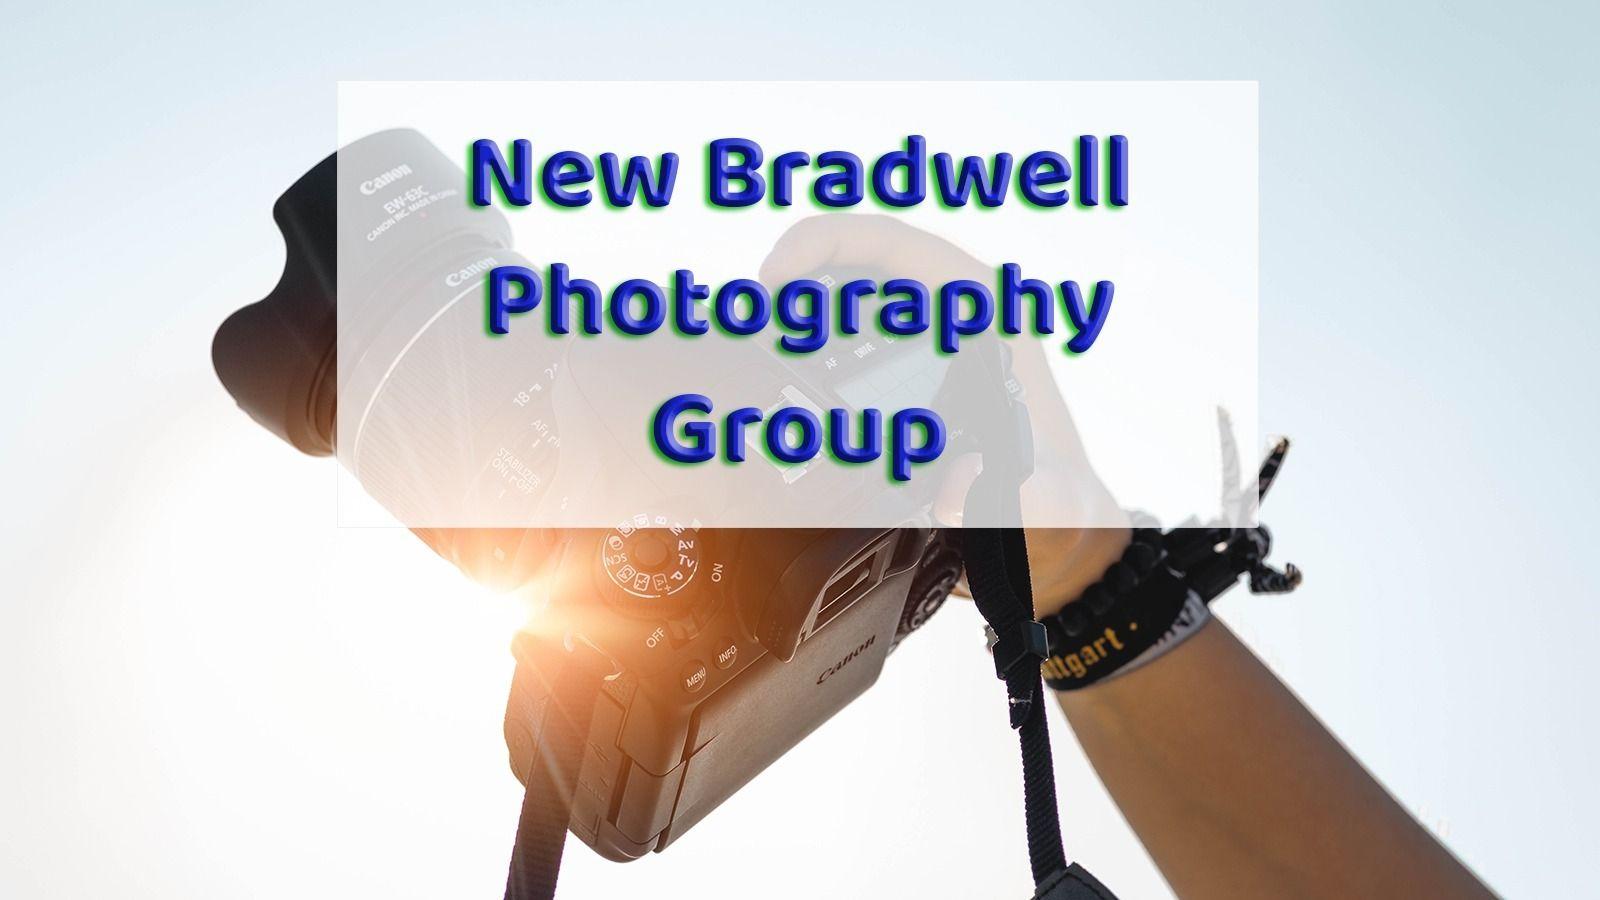 New Bradwell Photography Group